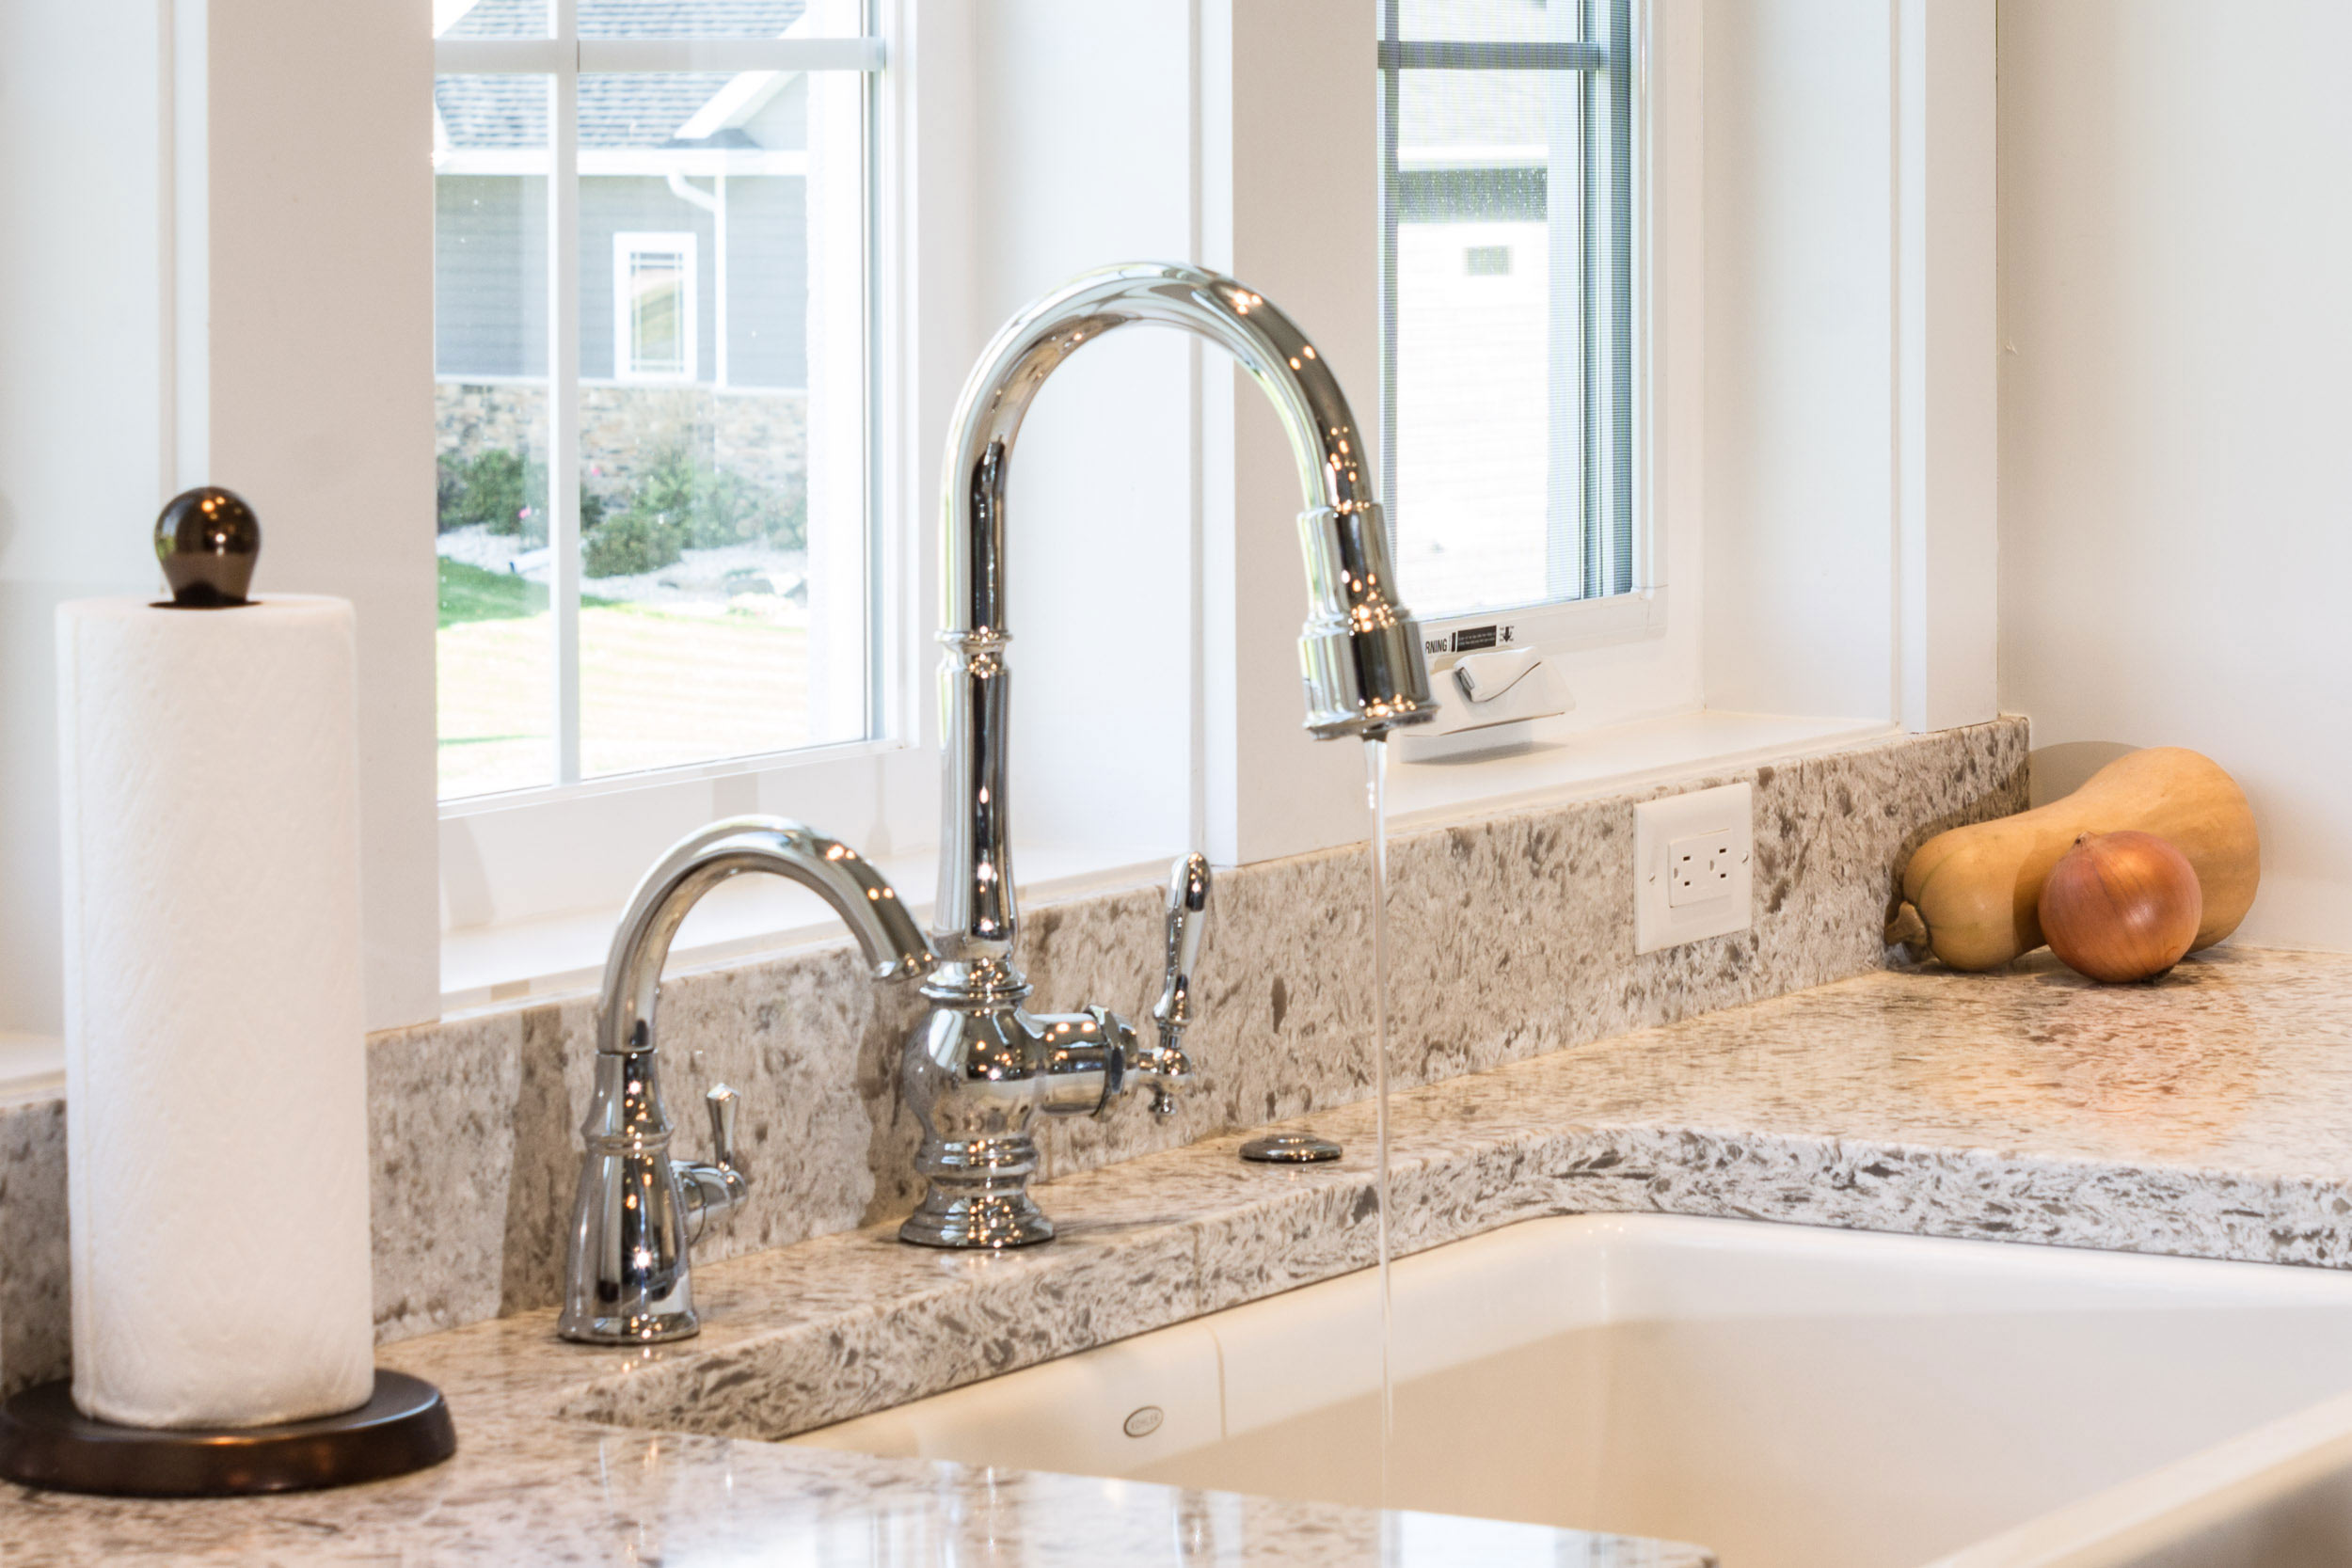 Kohler Whitehaven Apron Style Kitchen Sink and Kohler Artifacts Faucet